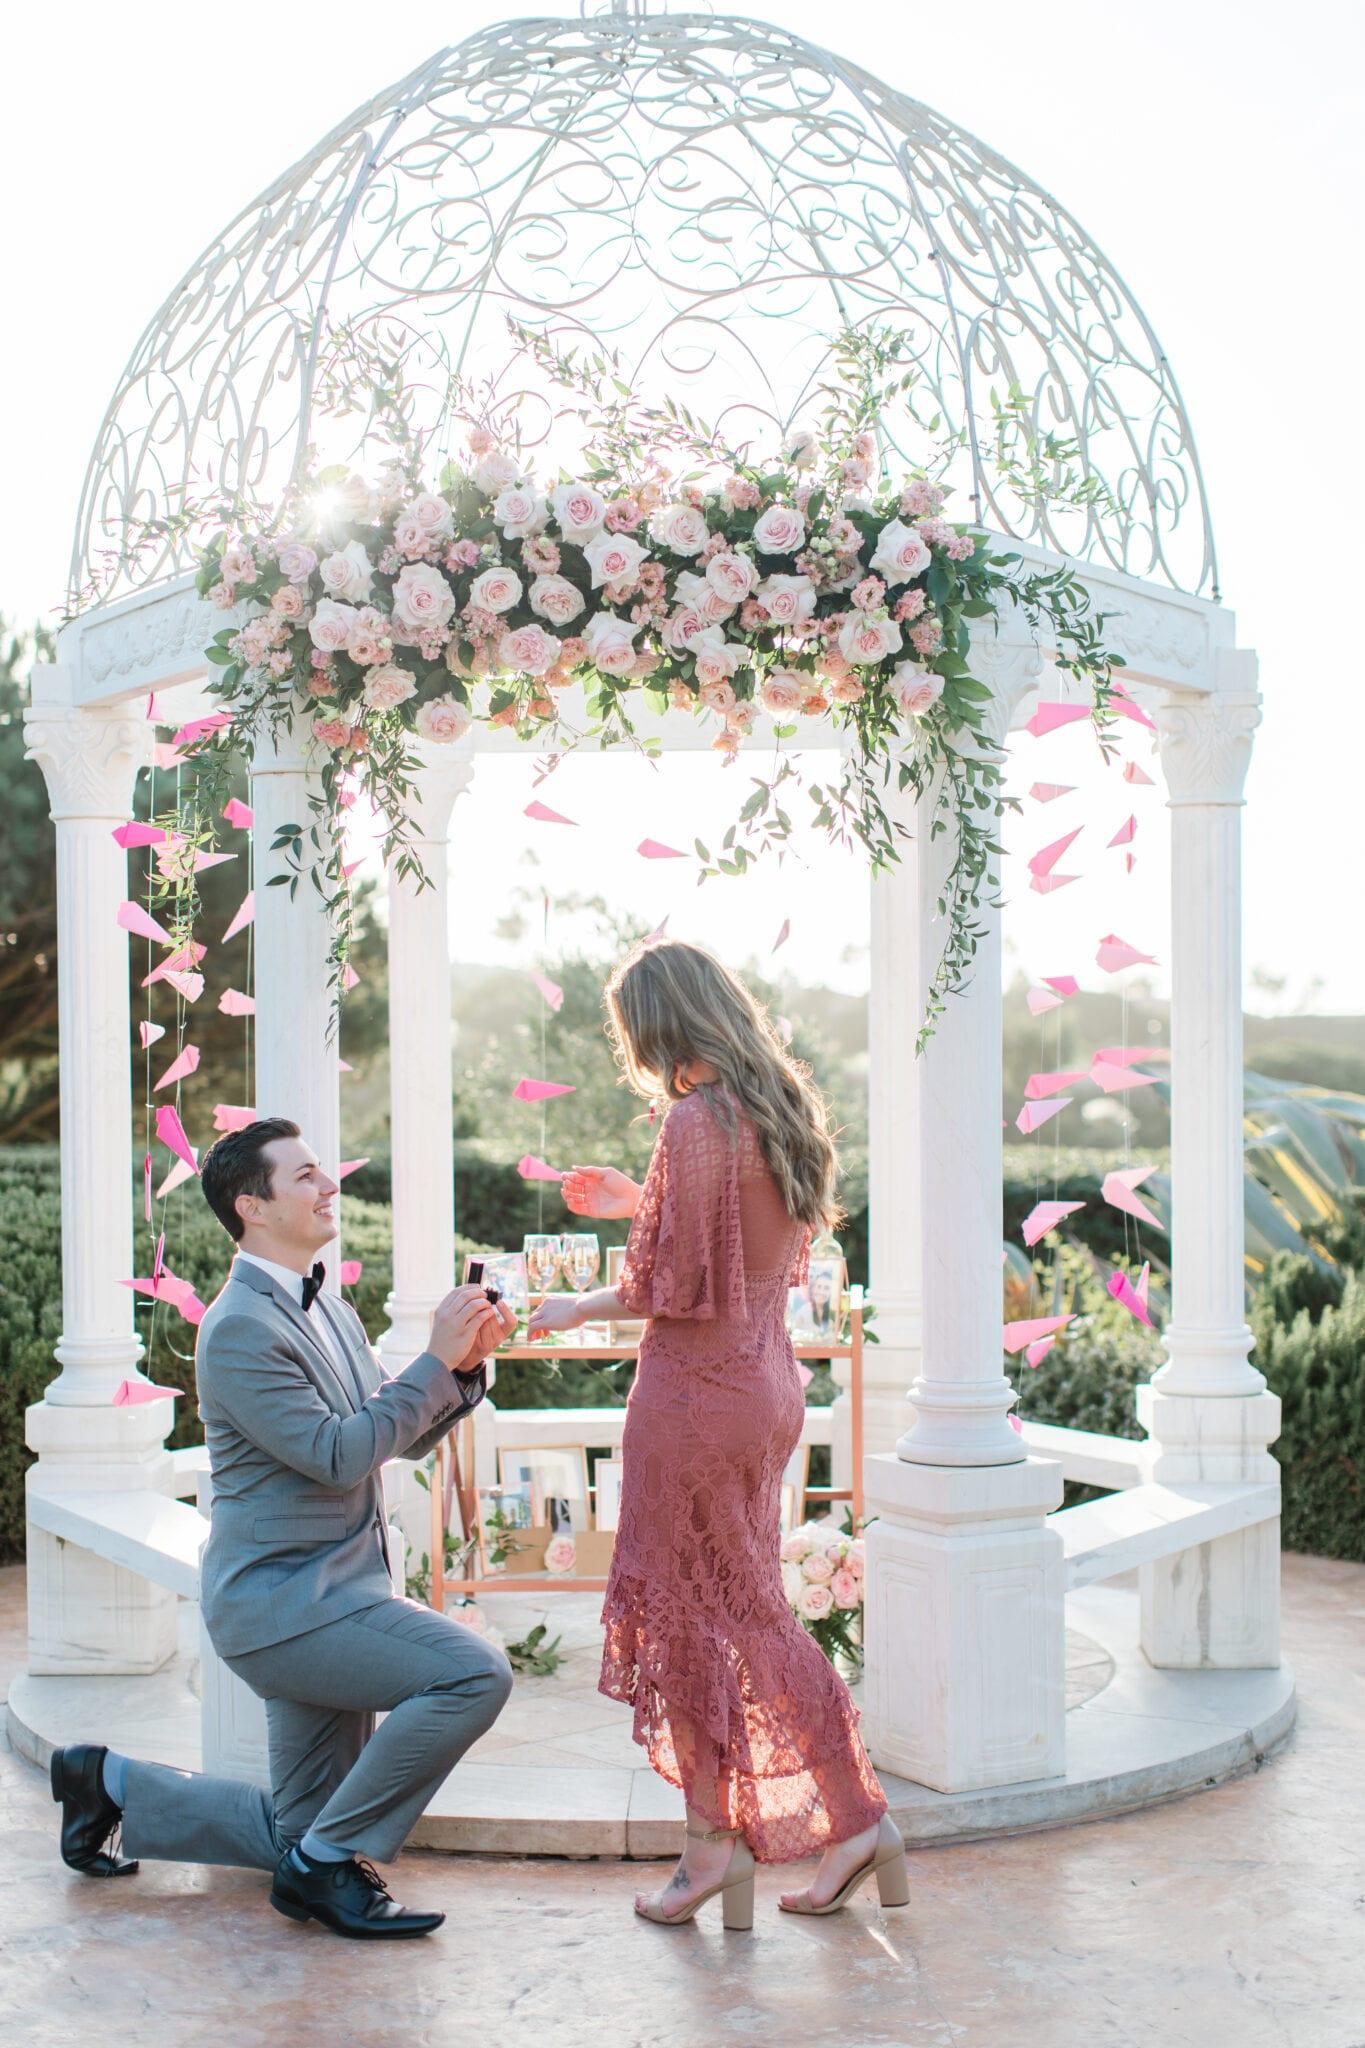 wedding proposal in front of gazebo